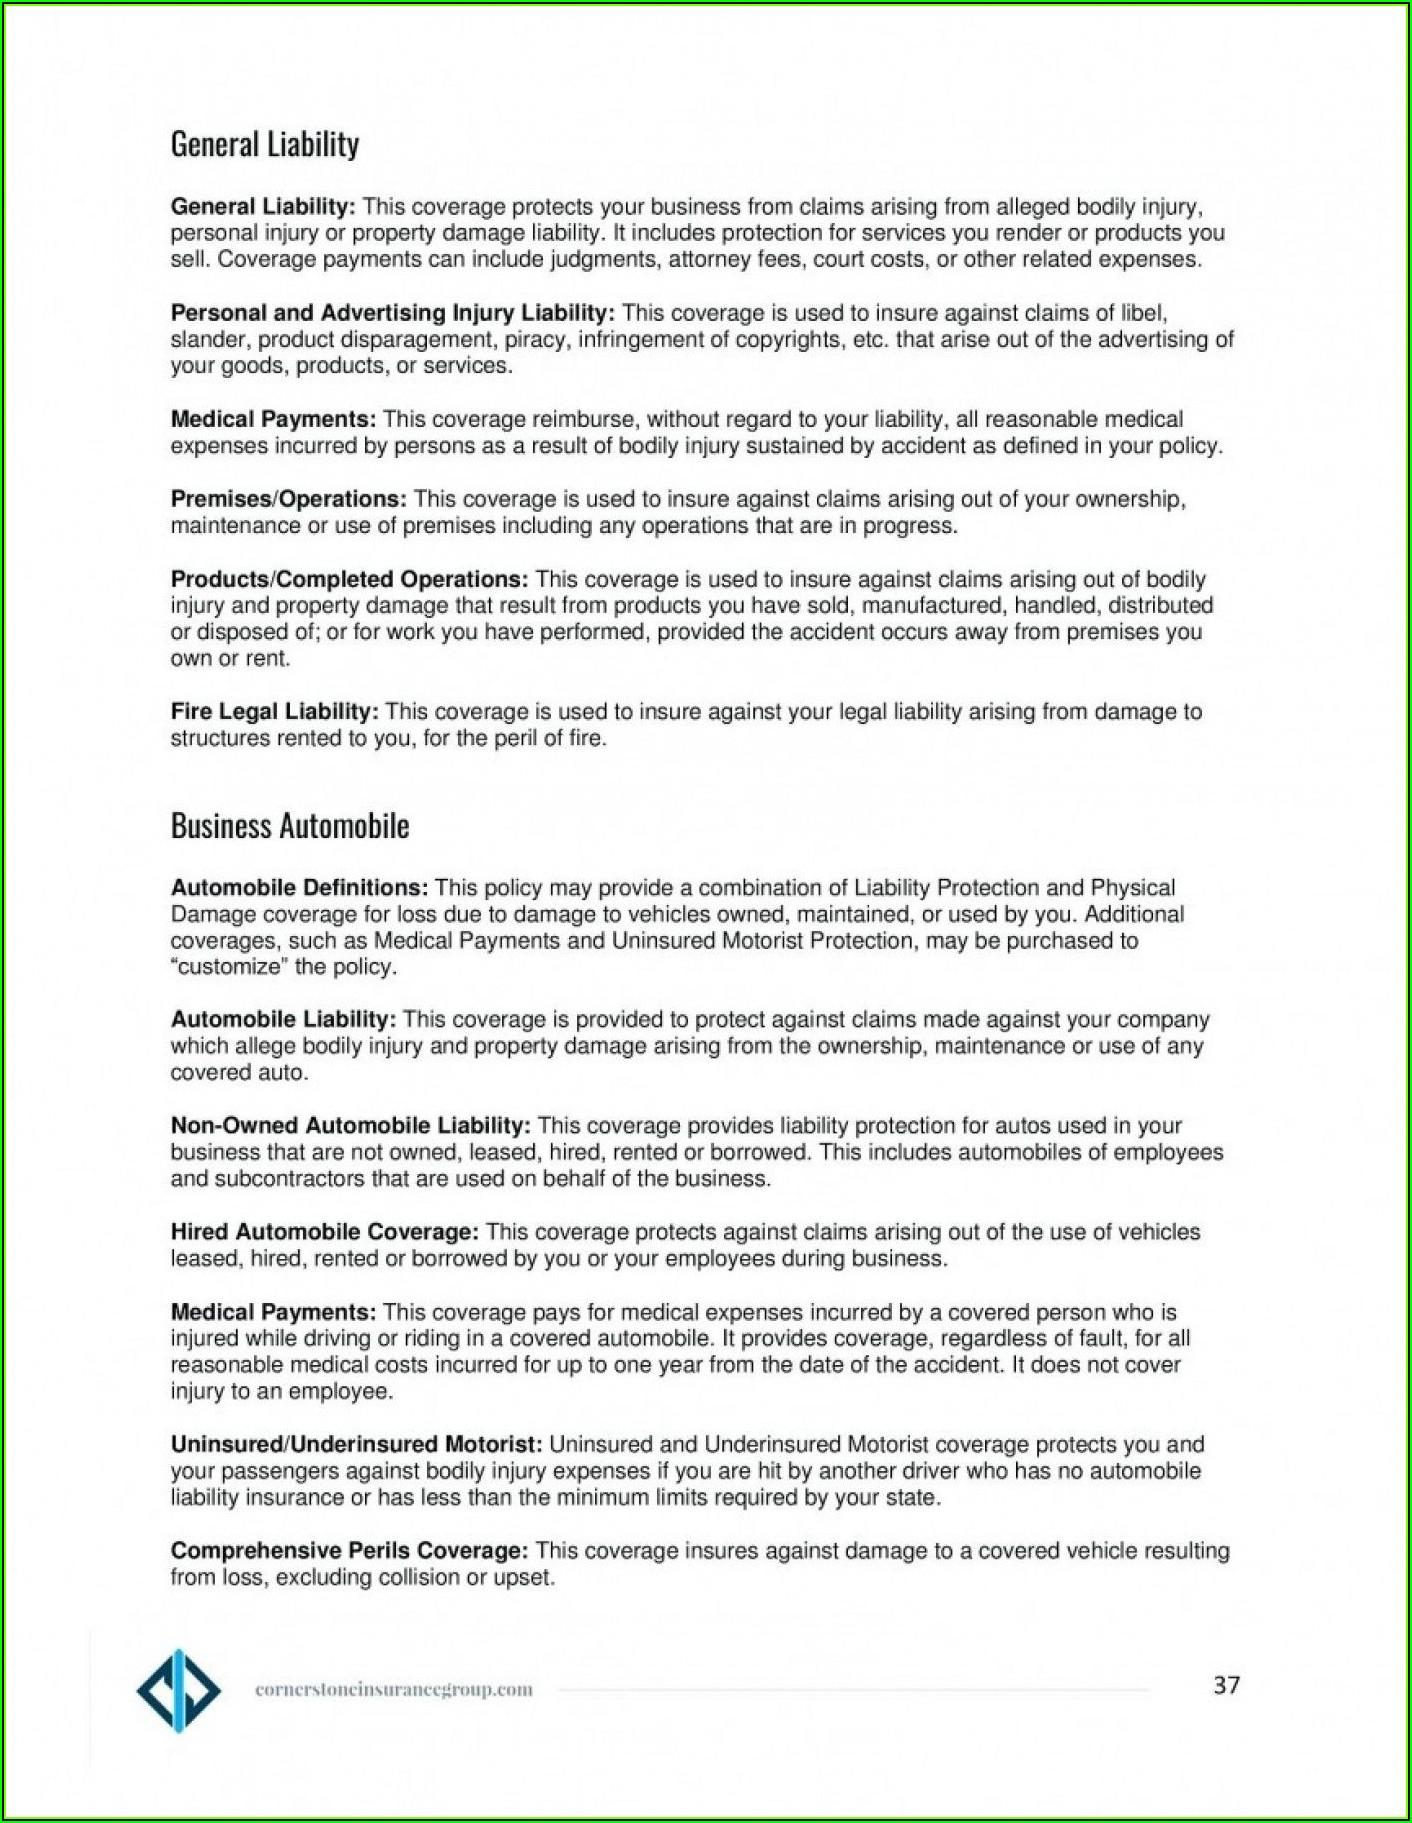 Company Credit Card Policy Template Australia